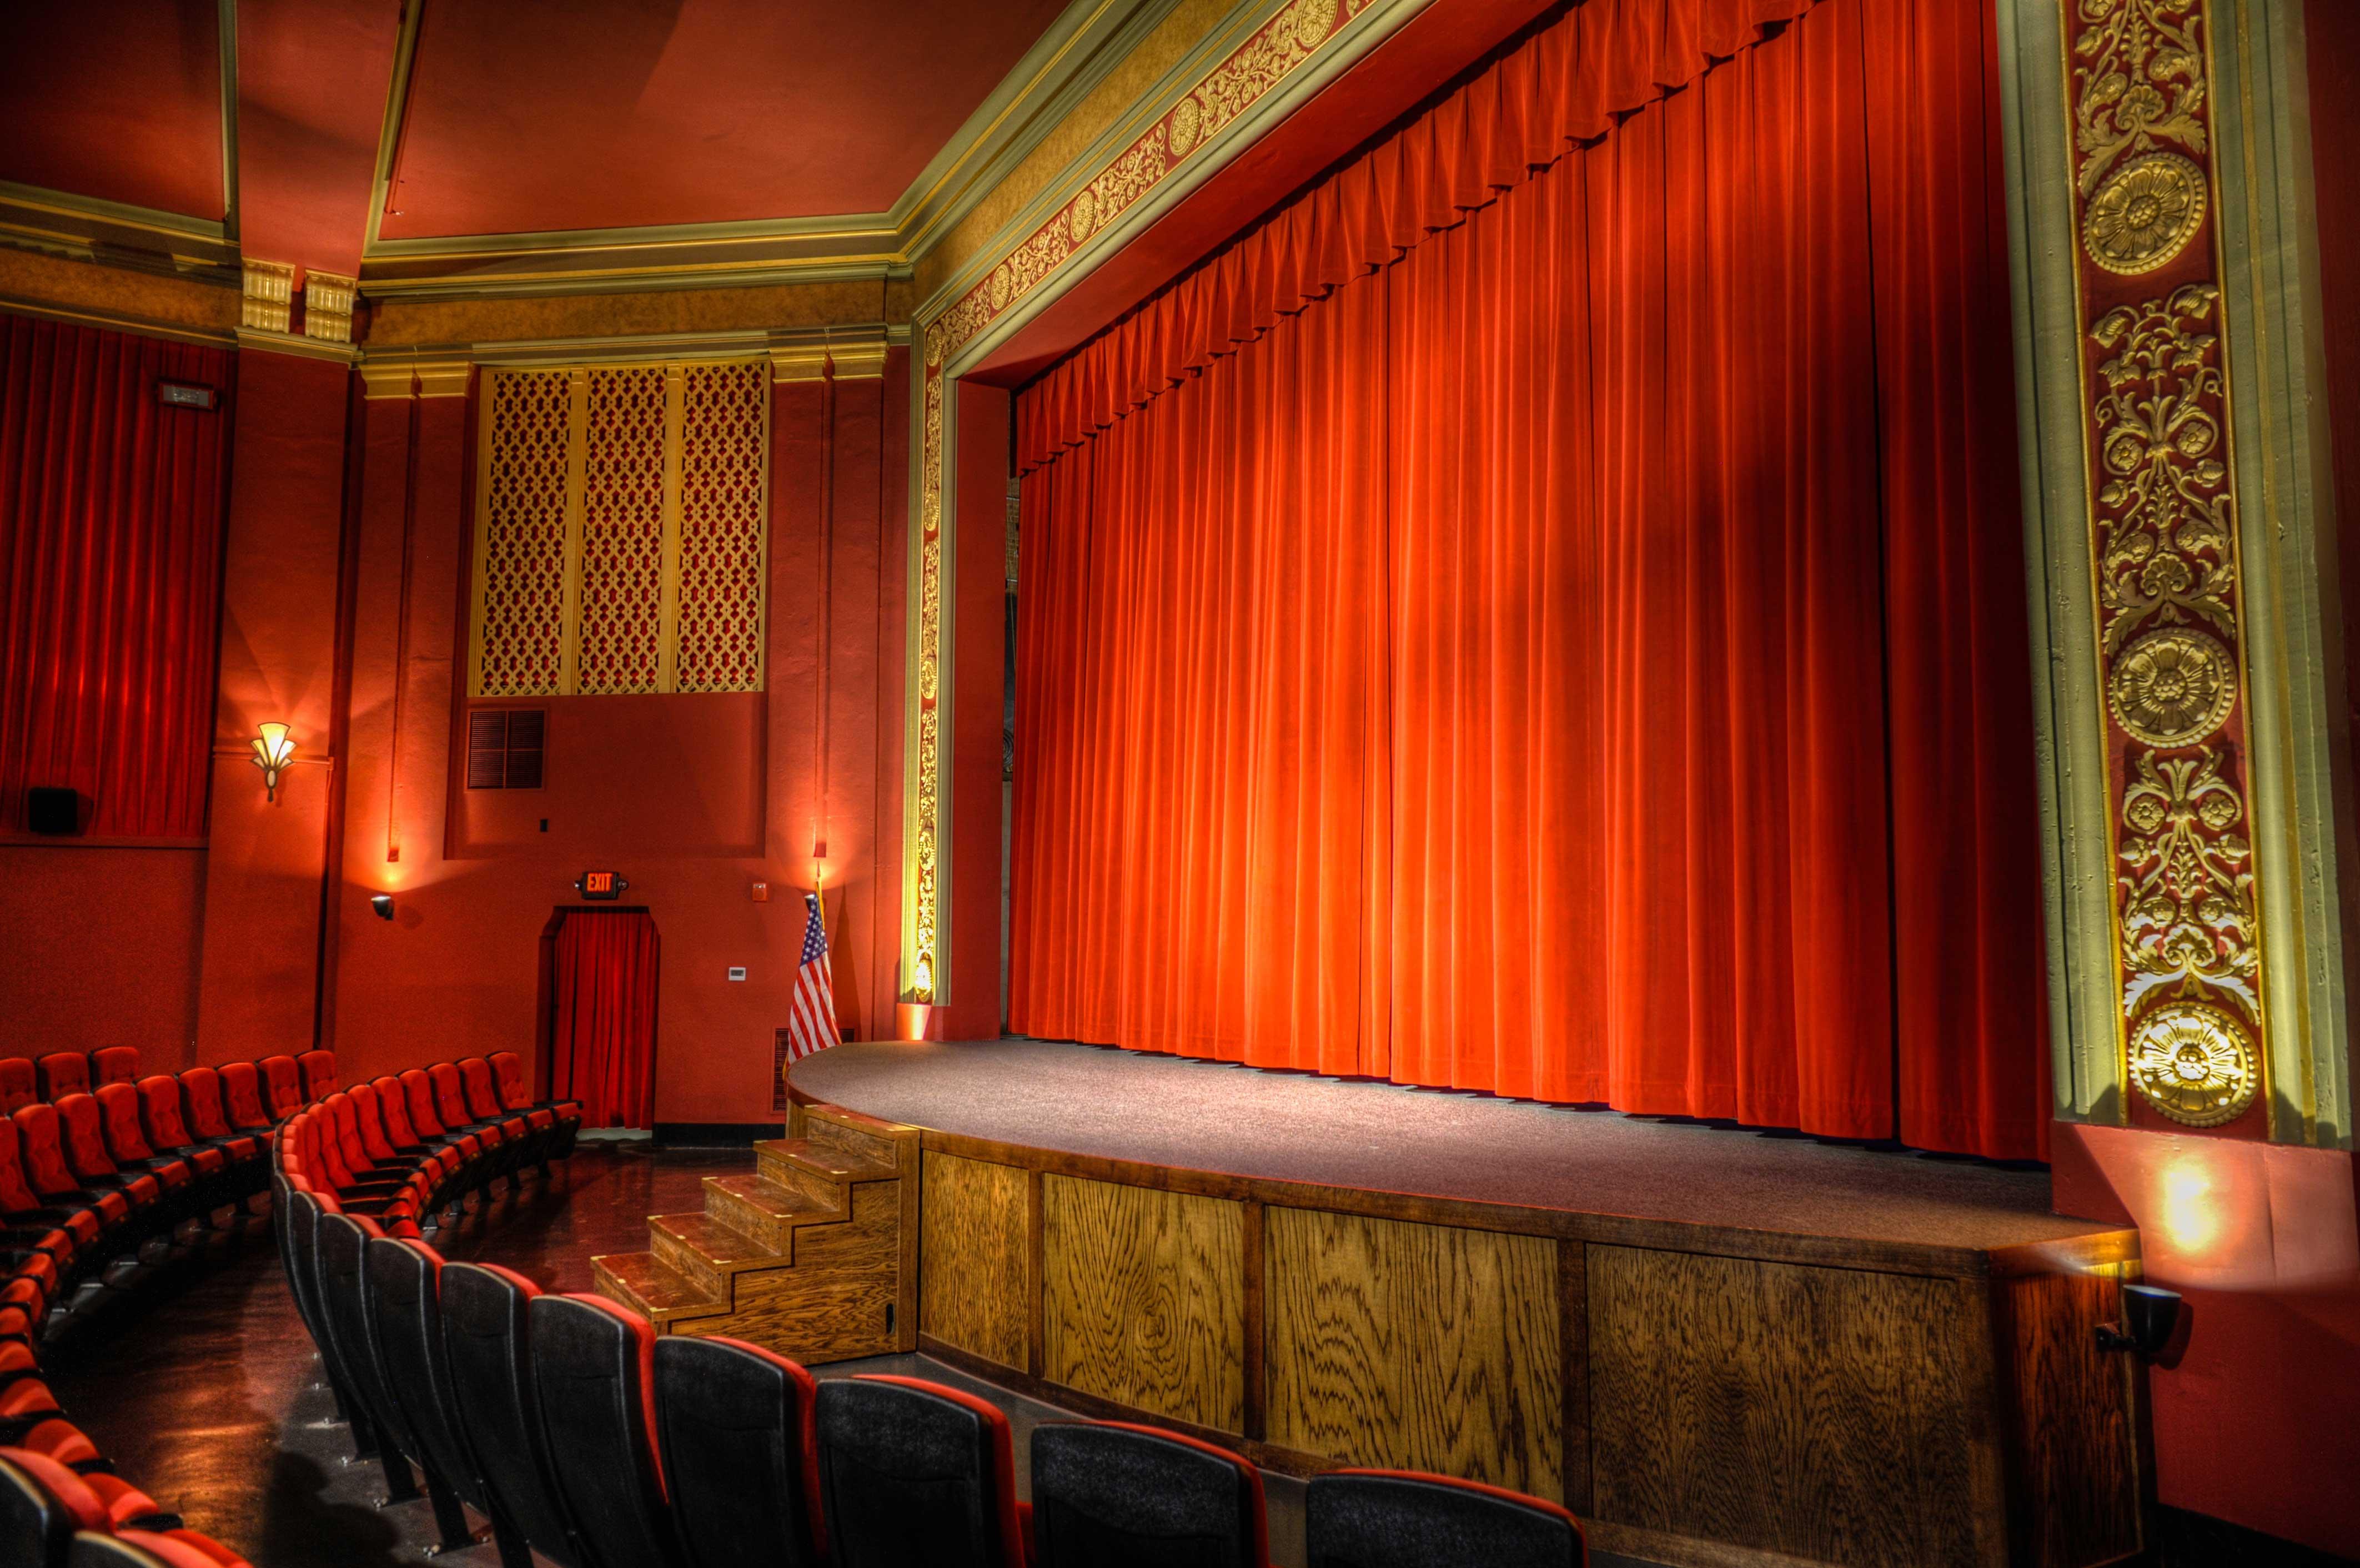 Rentals The World Theatre